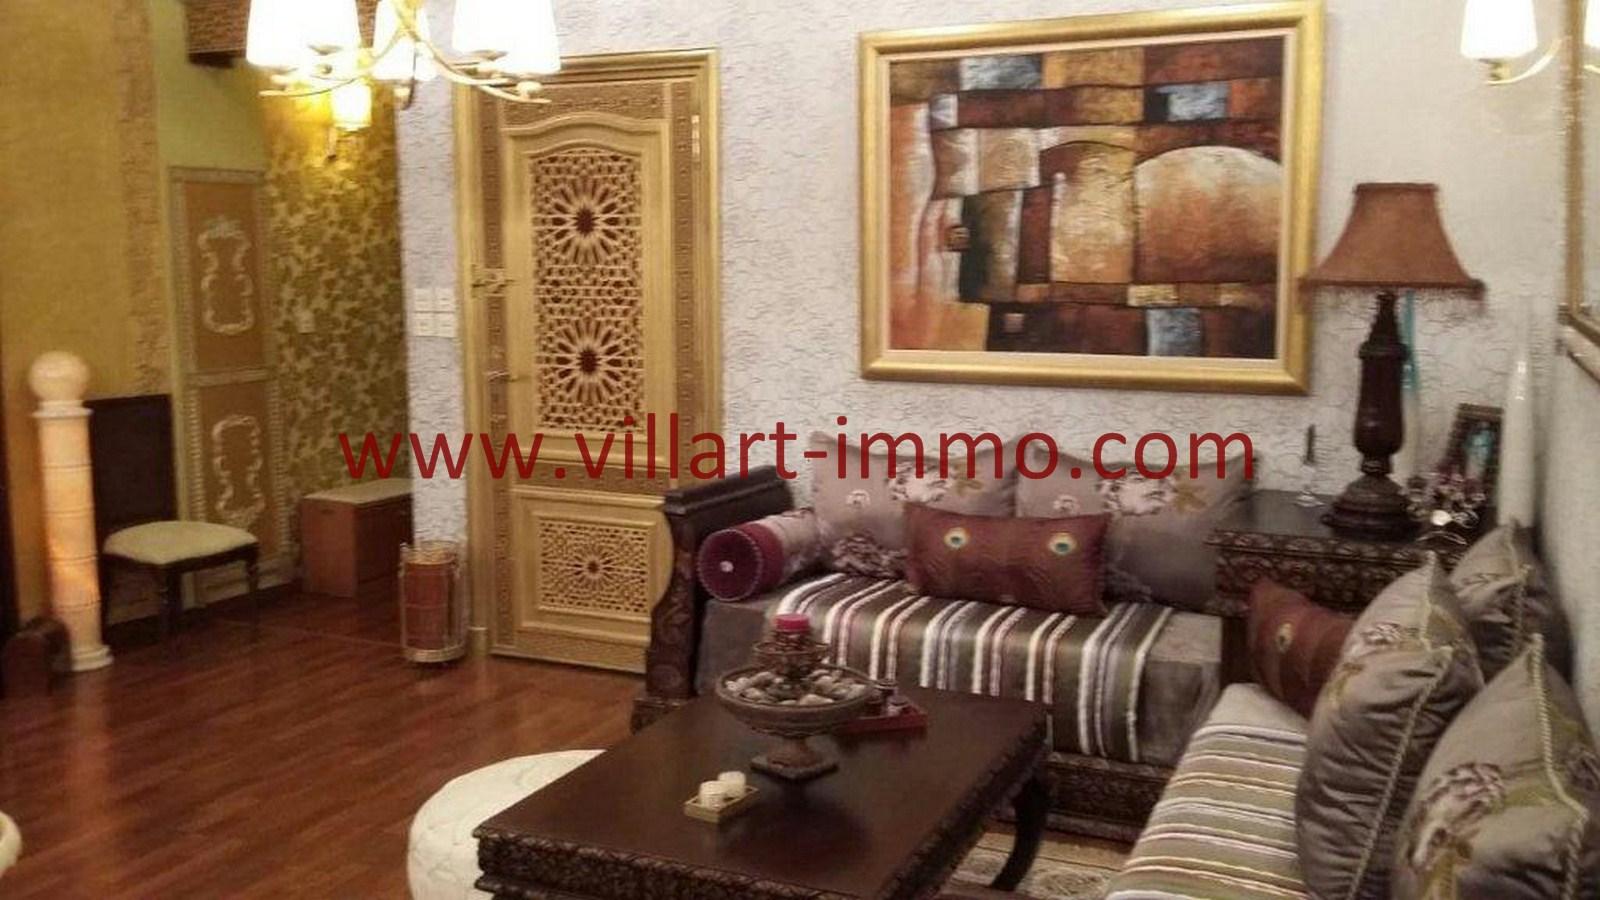 3-Vente-Appartement-Tanger-Entrée-VA560-Villart Immo